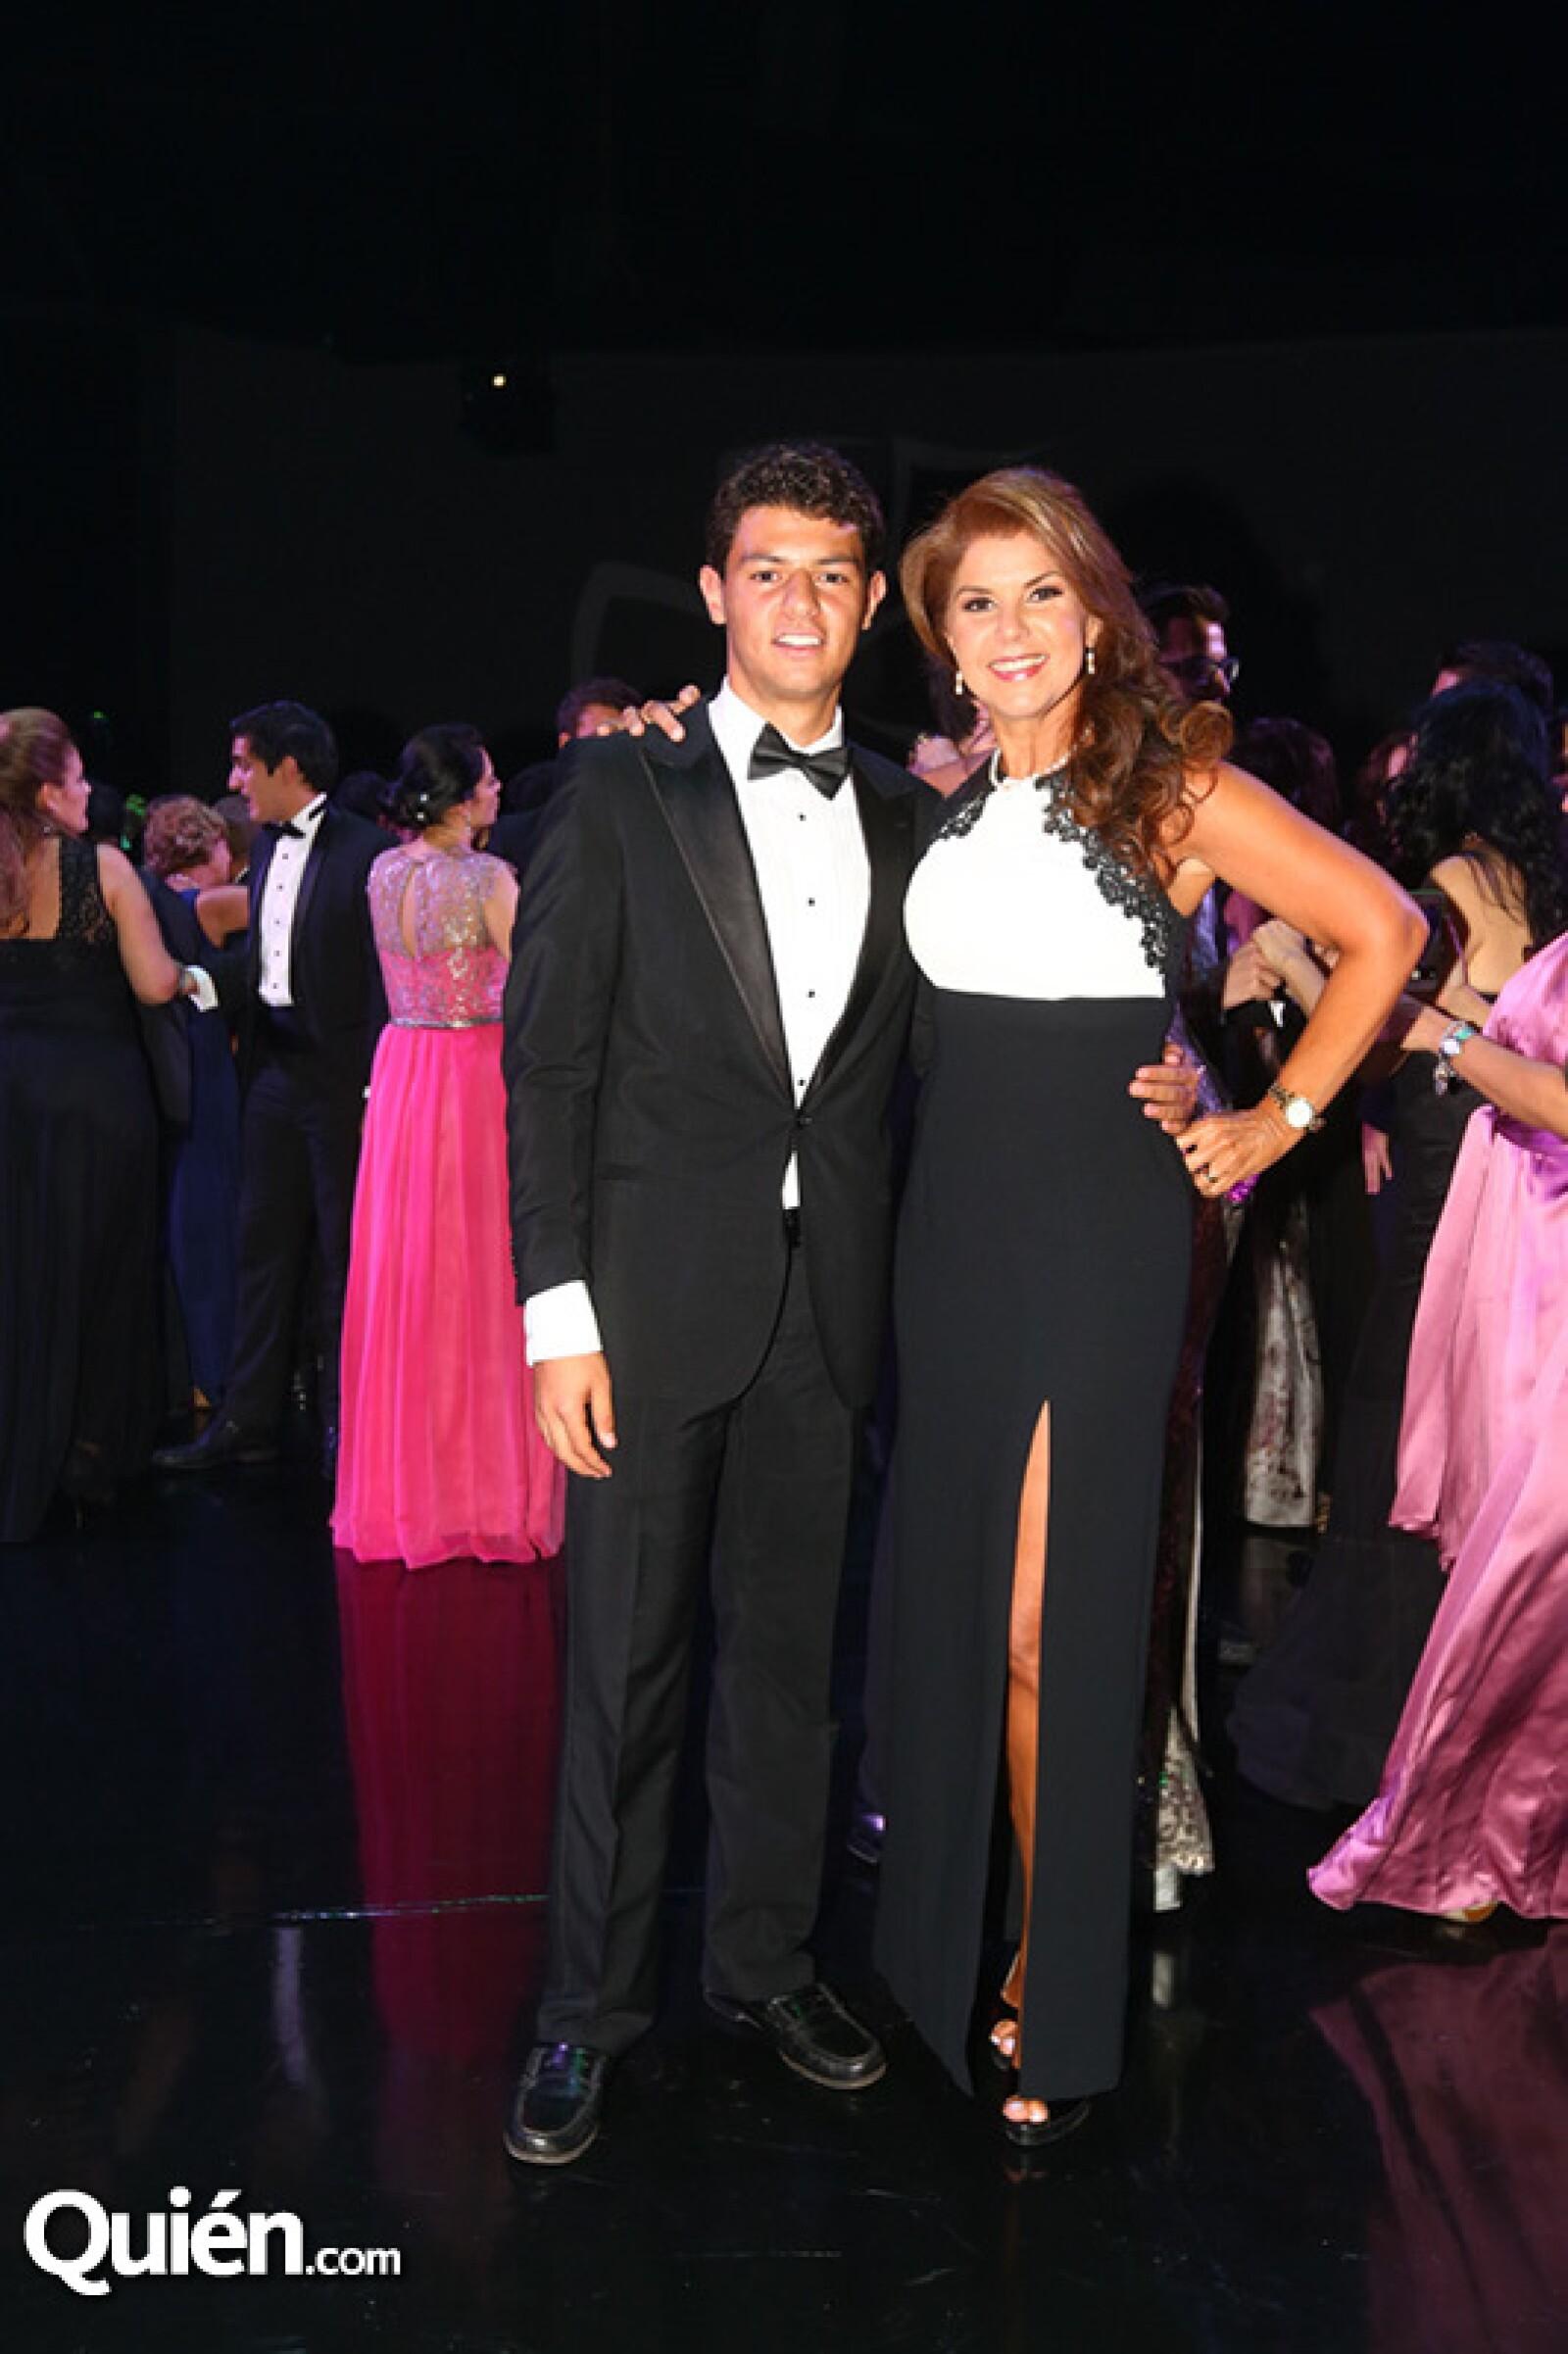 Manuel y Marina Gutiérrez